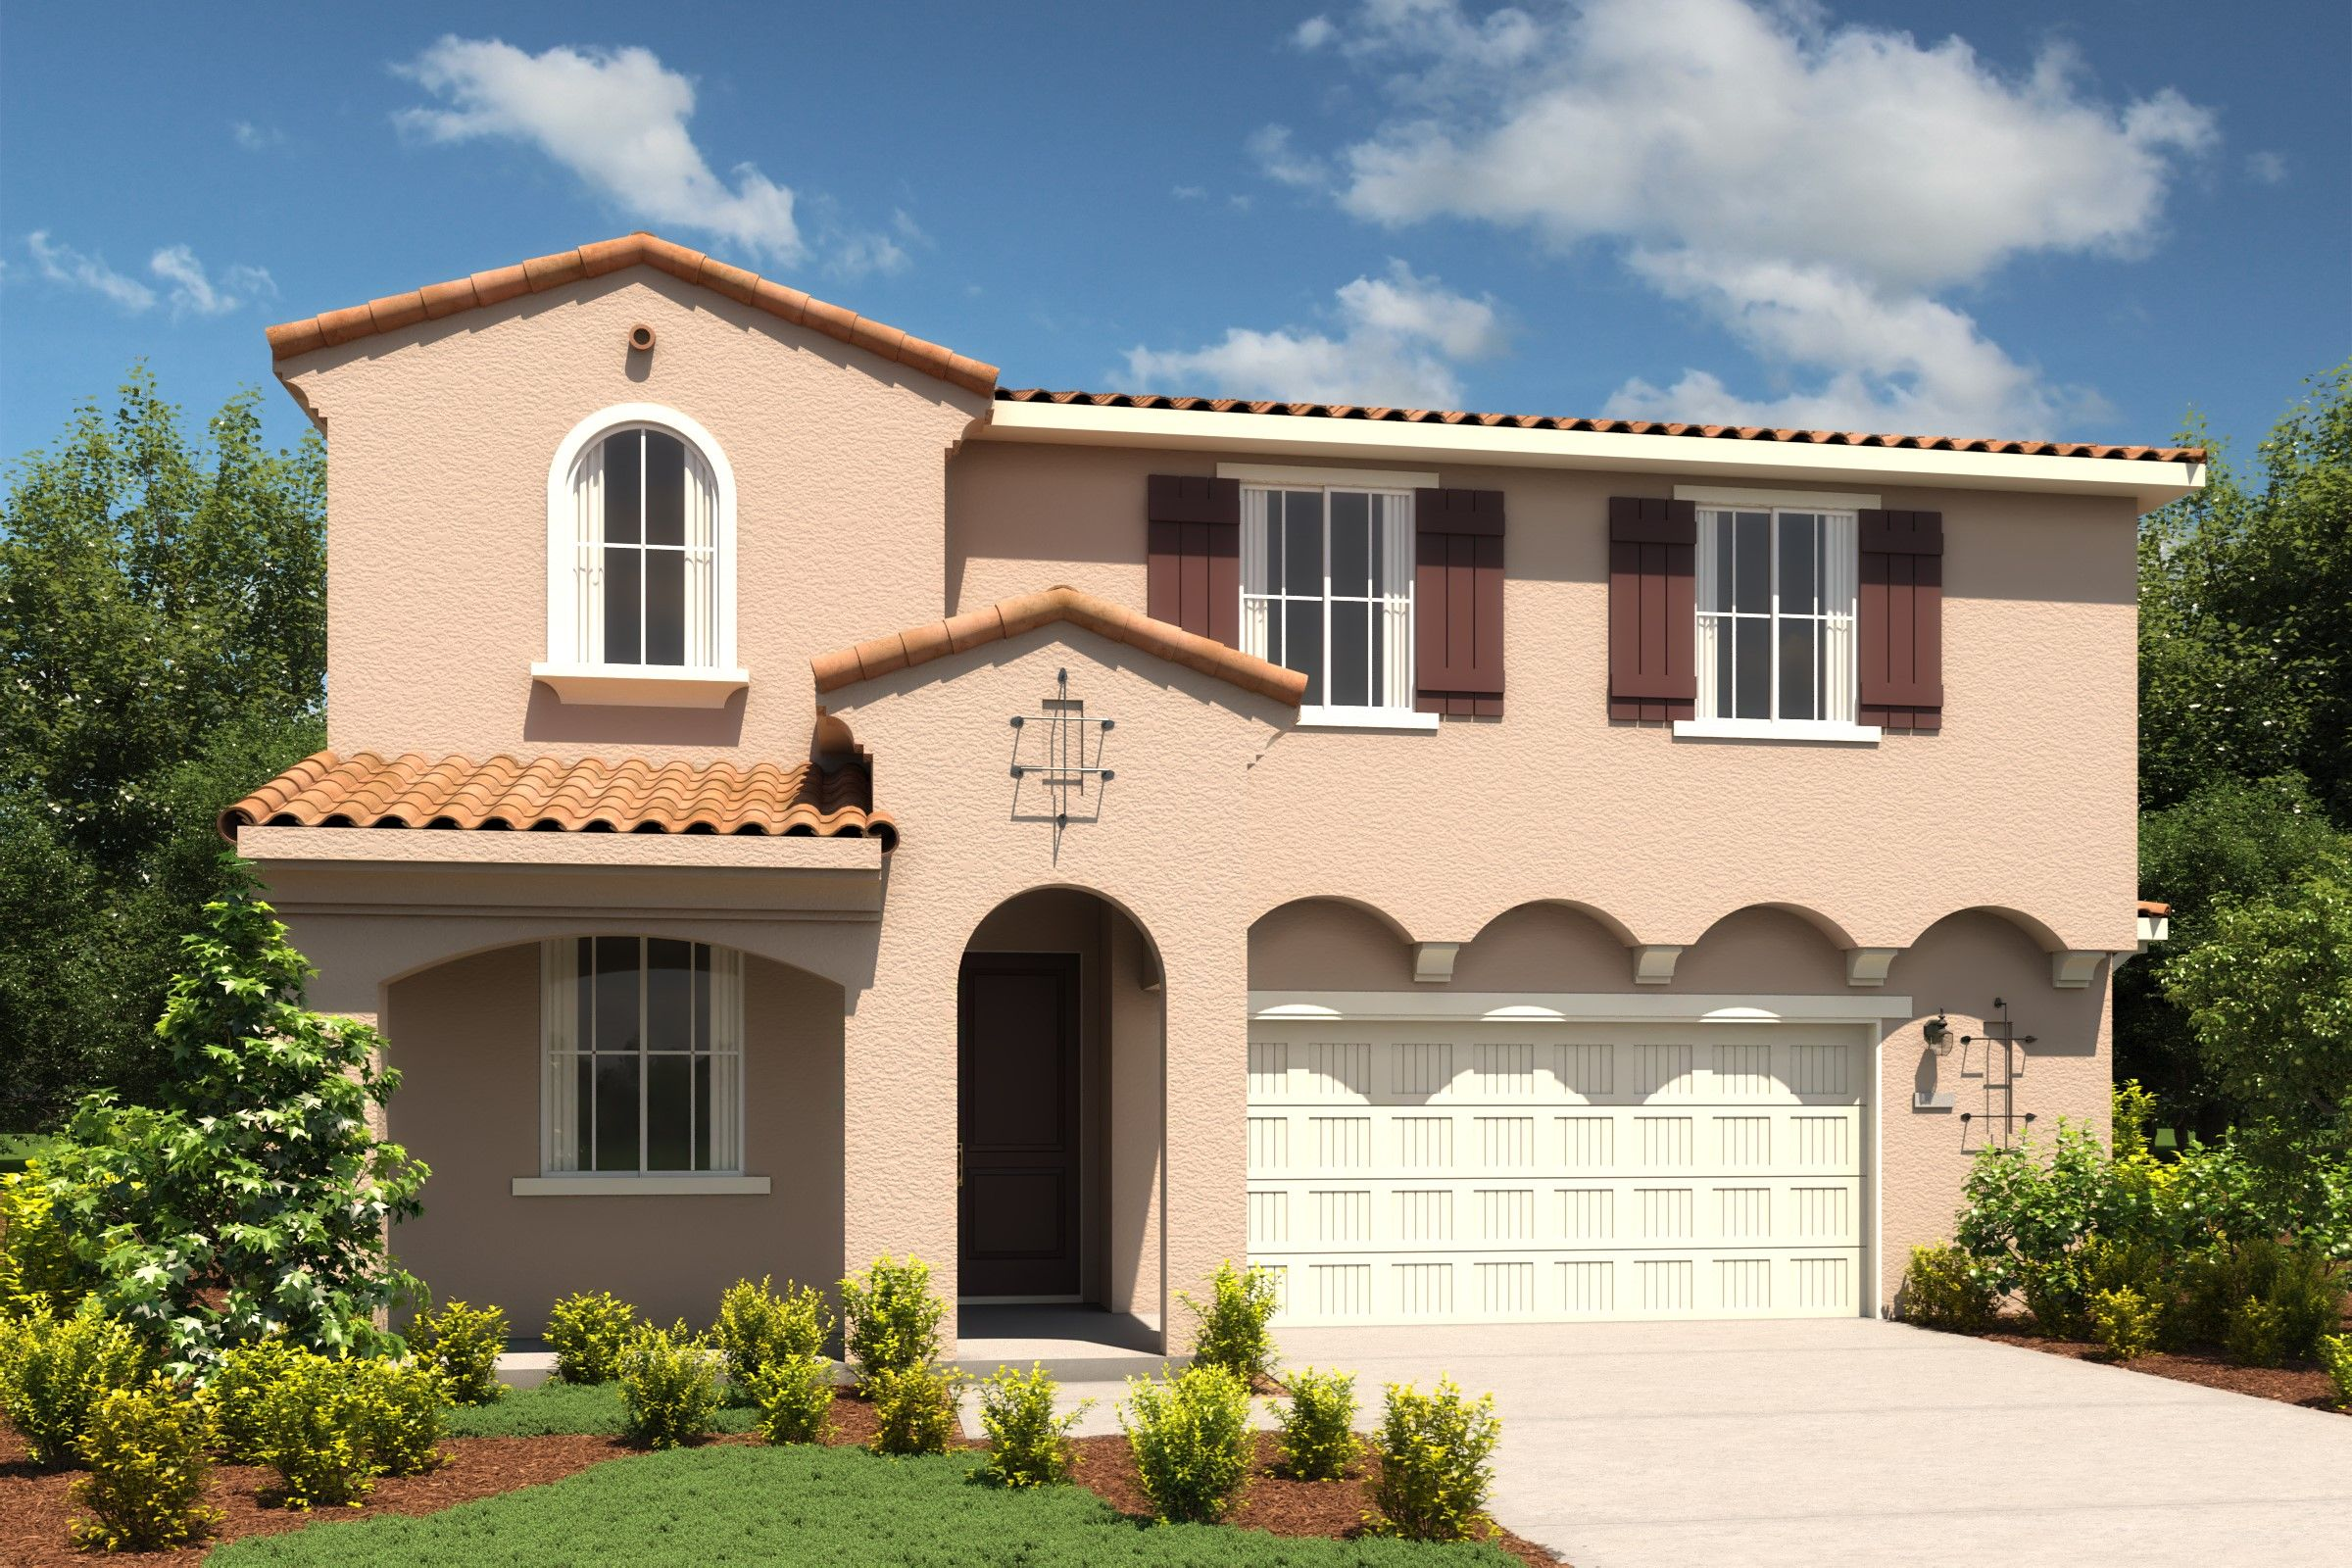 单亲家庭 为 销售 在 Meadowview At Mountain House - Iris 1040 South Prosperity Street Mountain House, California 95391 United States